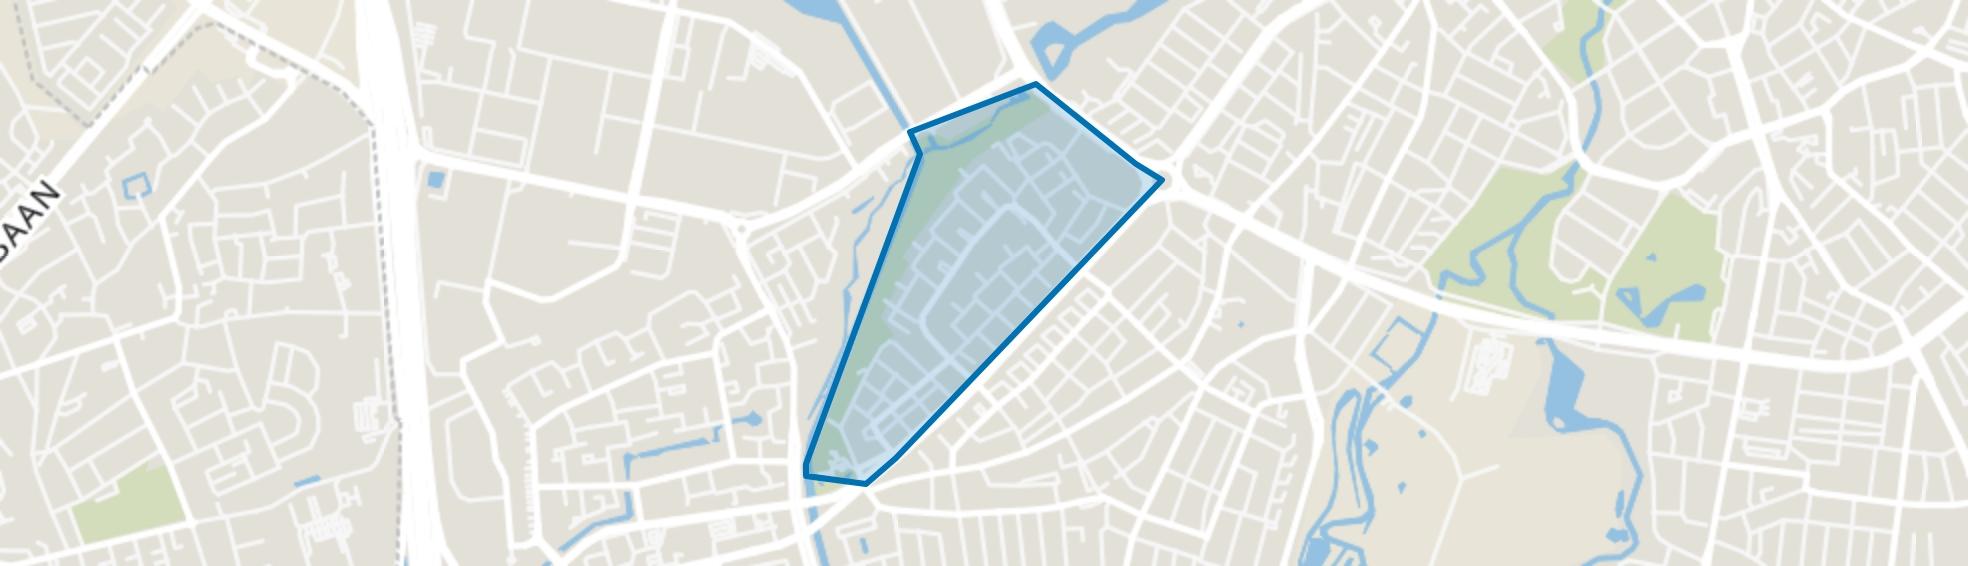 Genderdal, Eindhoven map